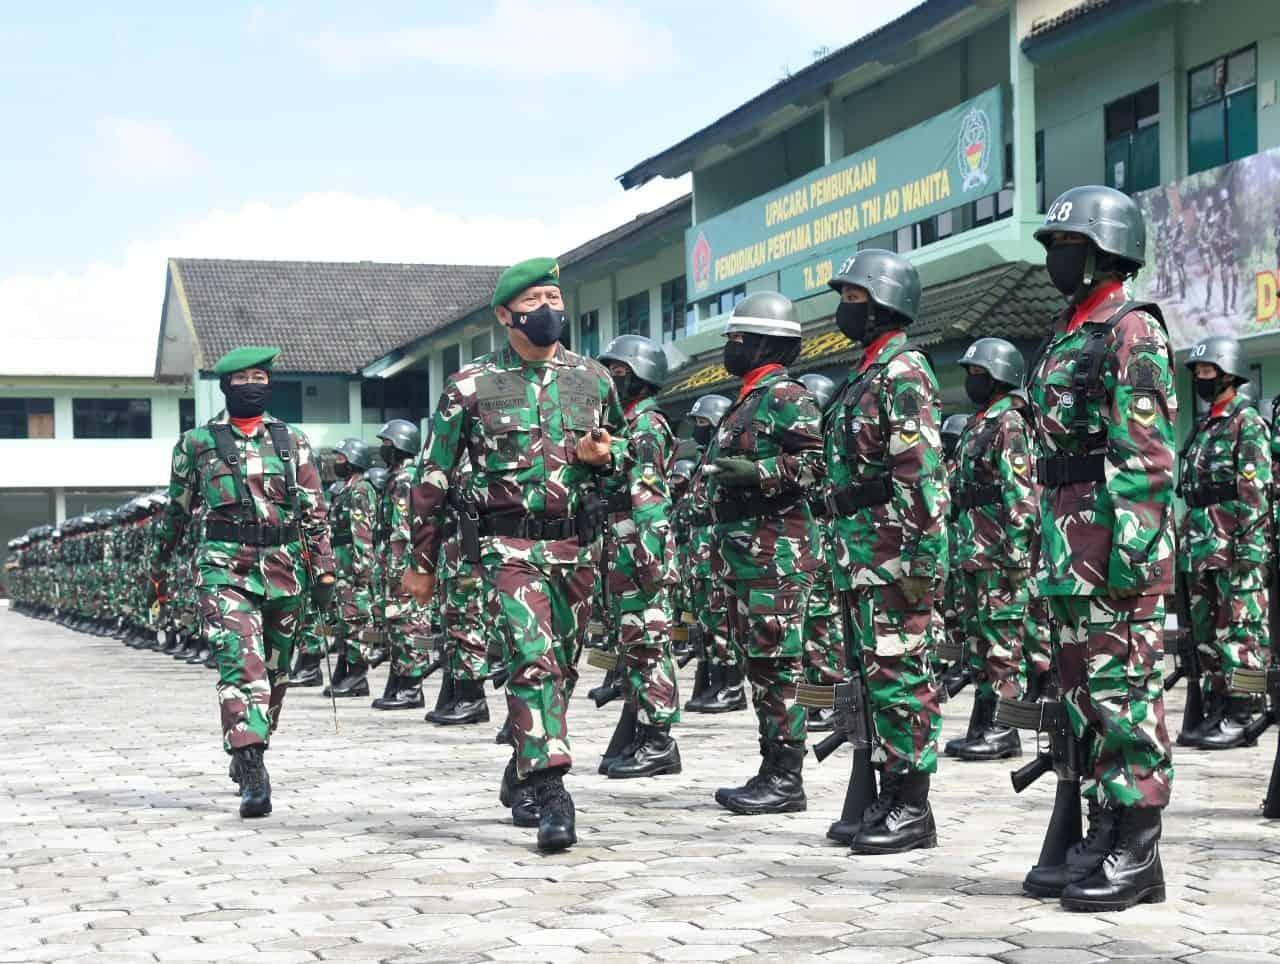 Dankodiklatad : TNI AD Berkomitmen Membentuk Sikap Prajurit Sapta Marga.